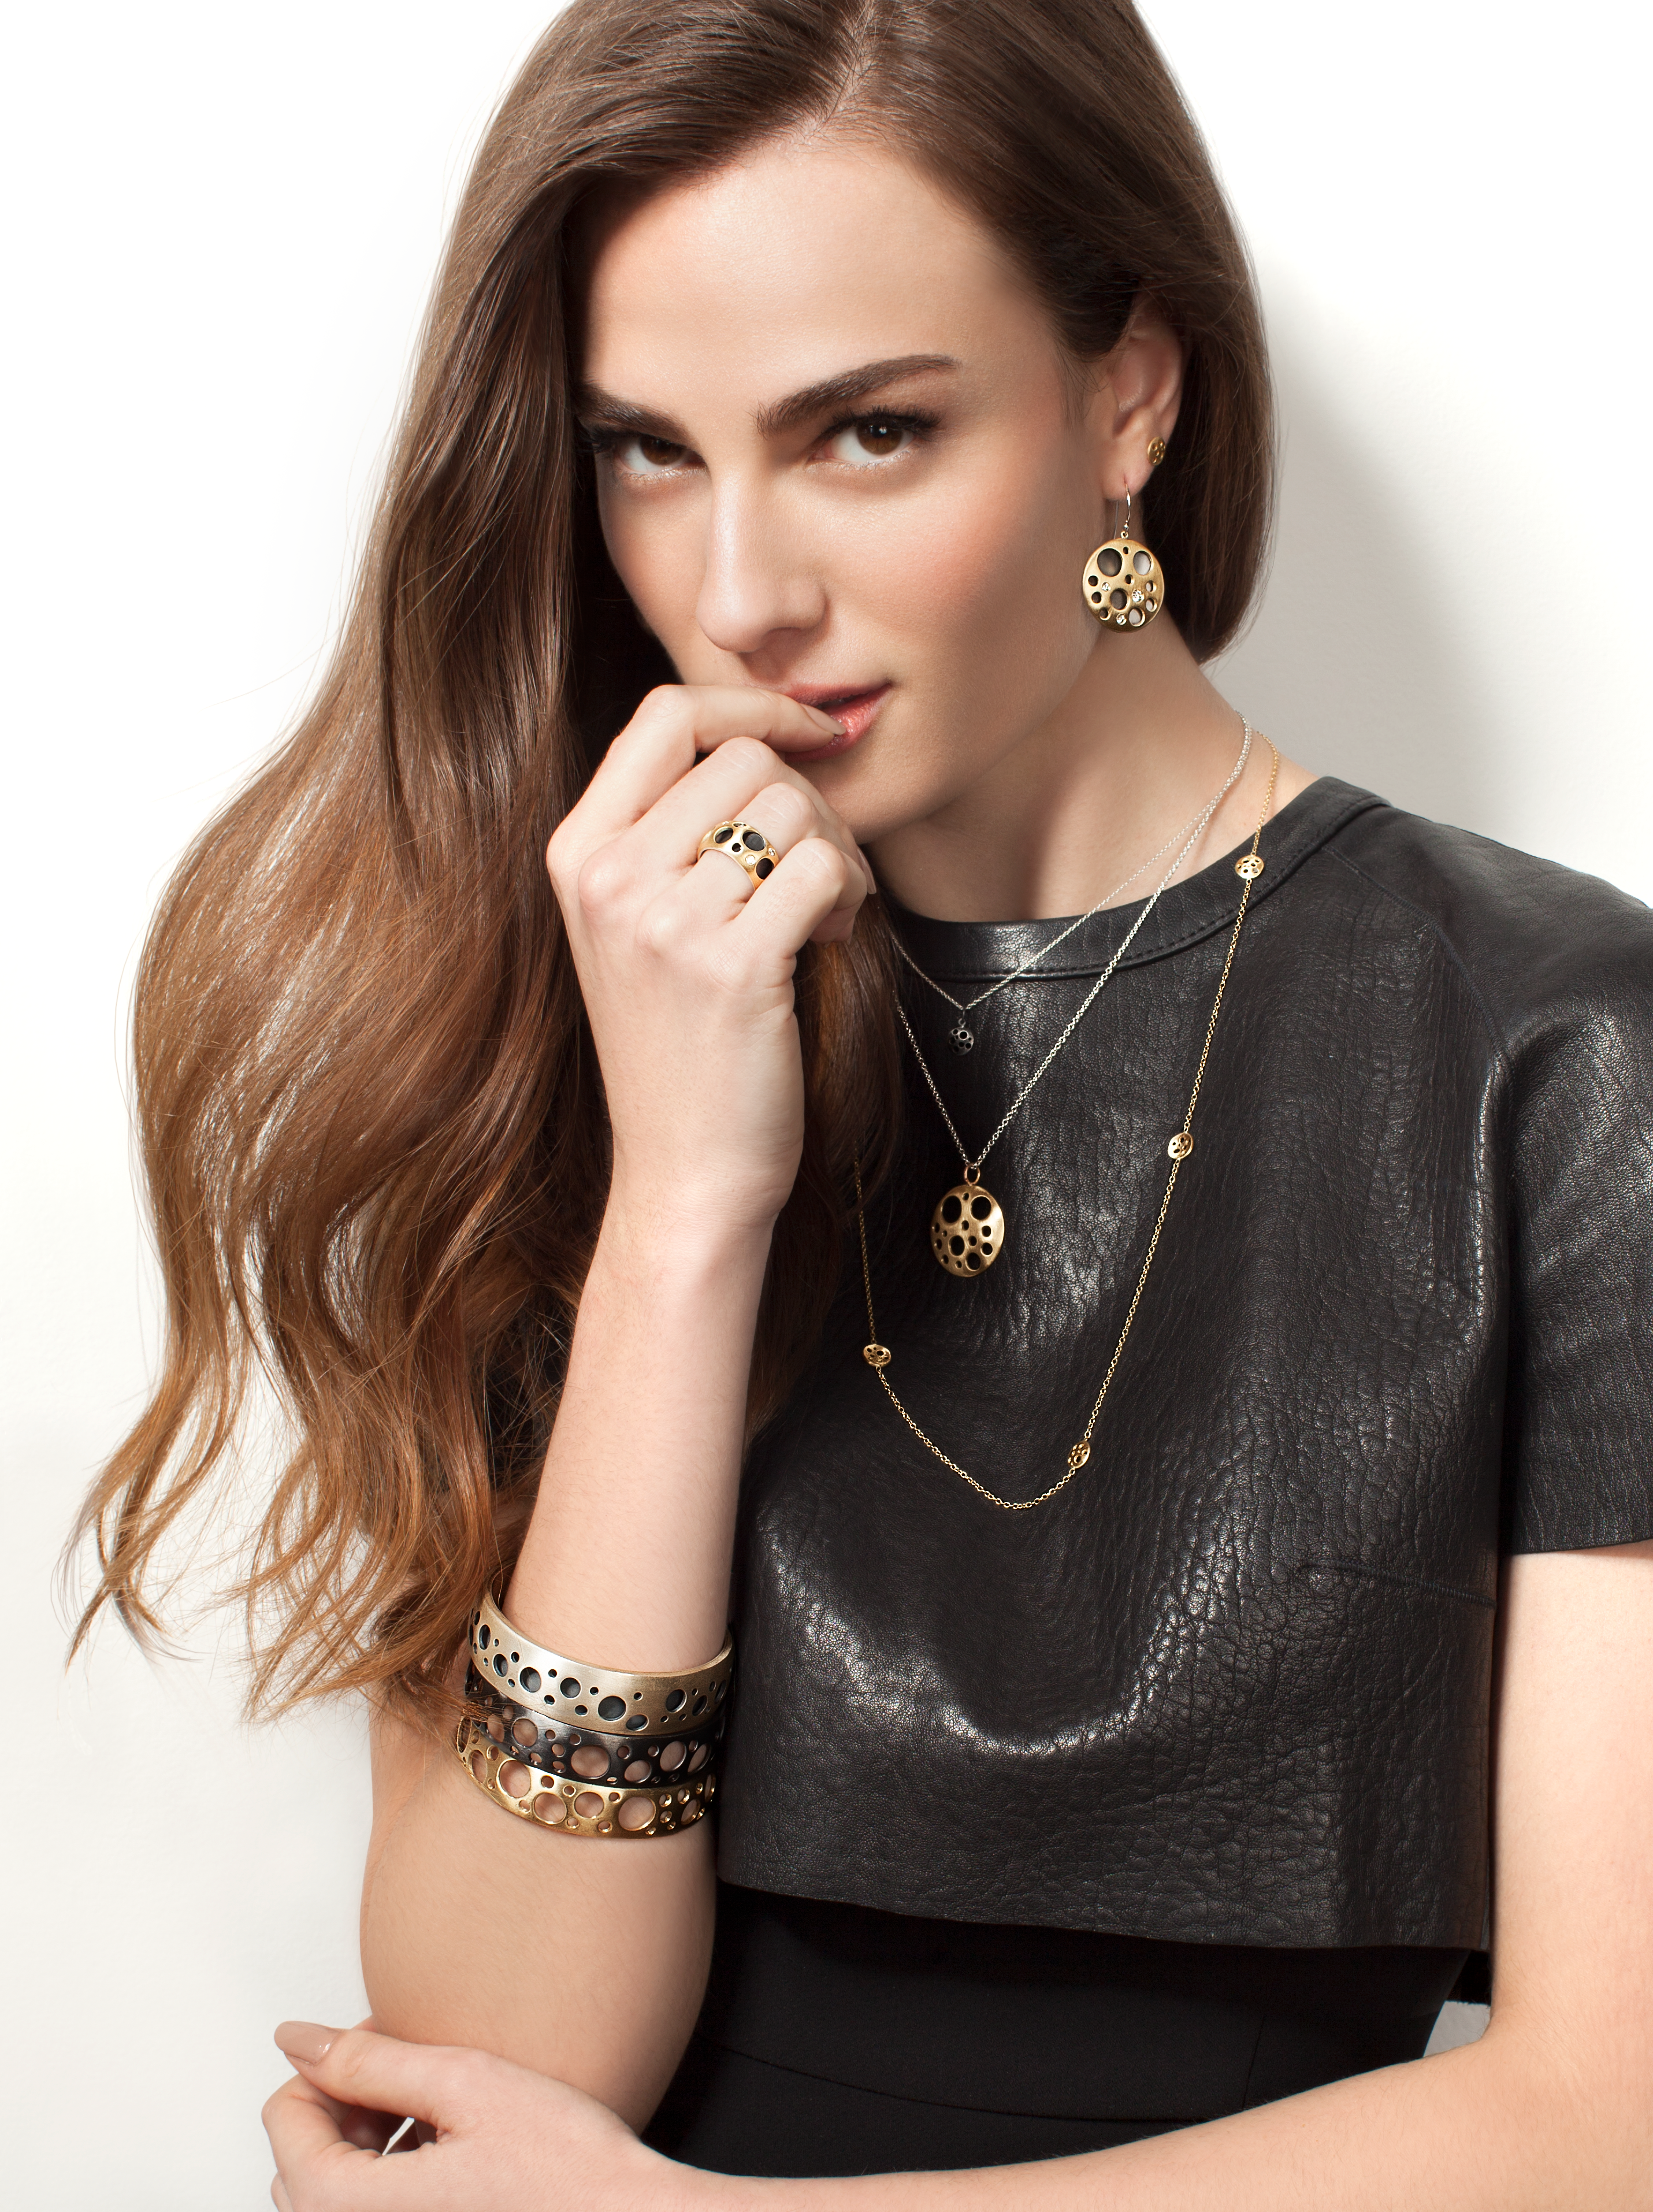 Jewelry Campaign